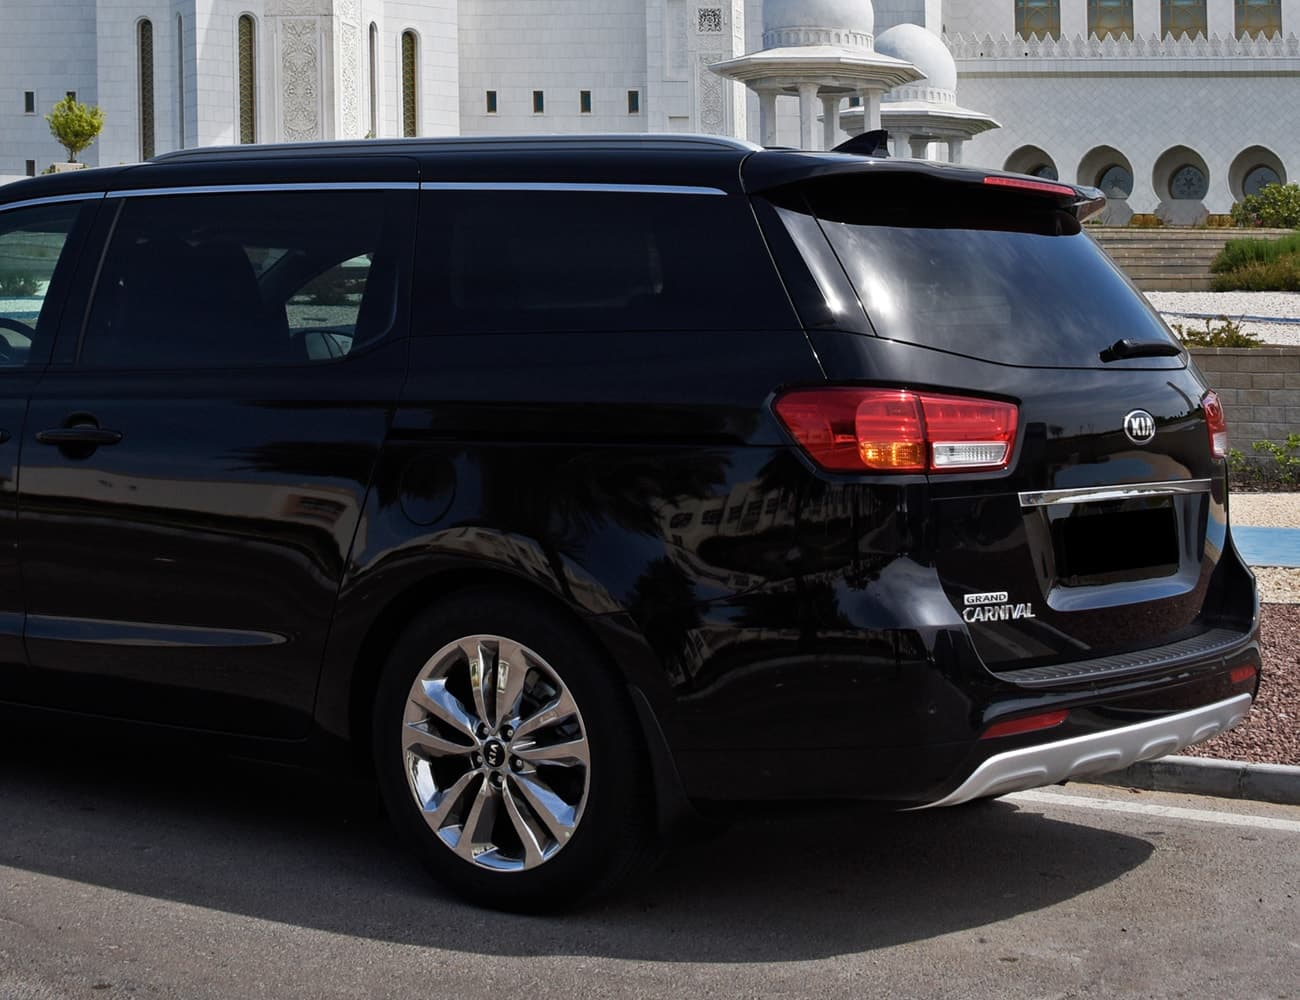 Minivan Kia Carnival blindada com motorista presidente, disposição, diária